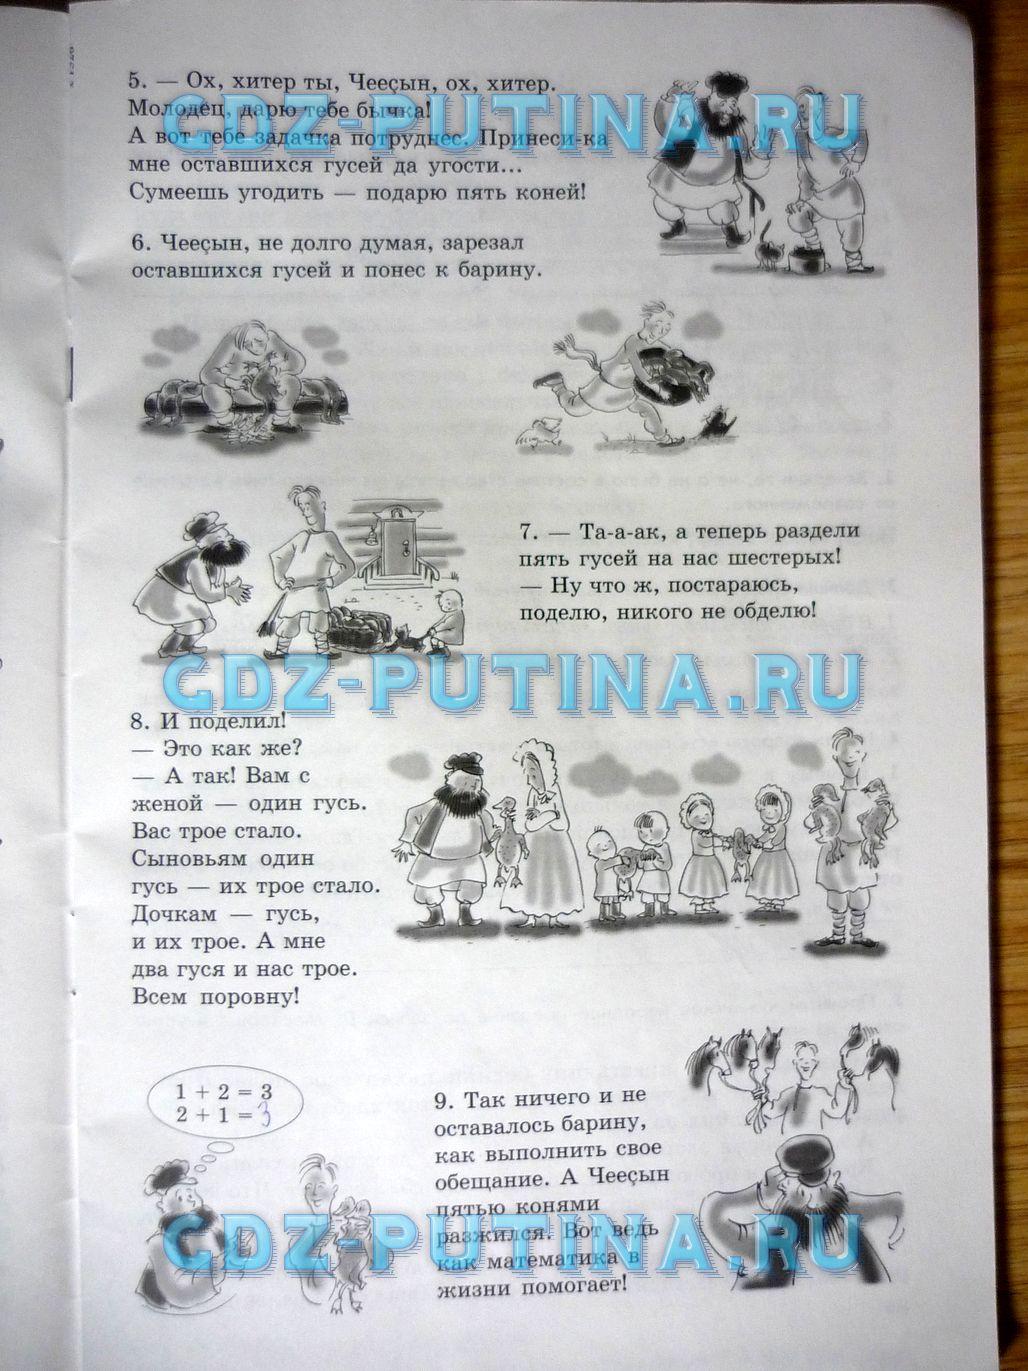 Гдз по родному языку 5 класс саяхова